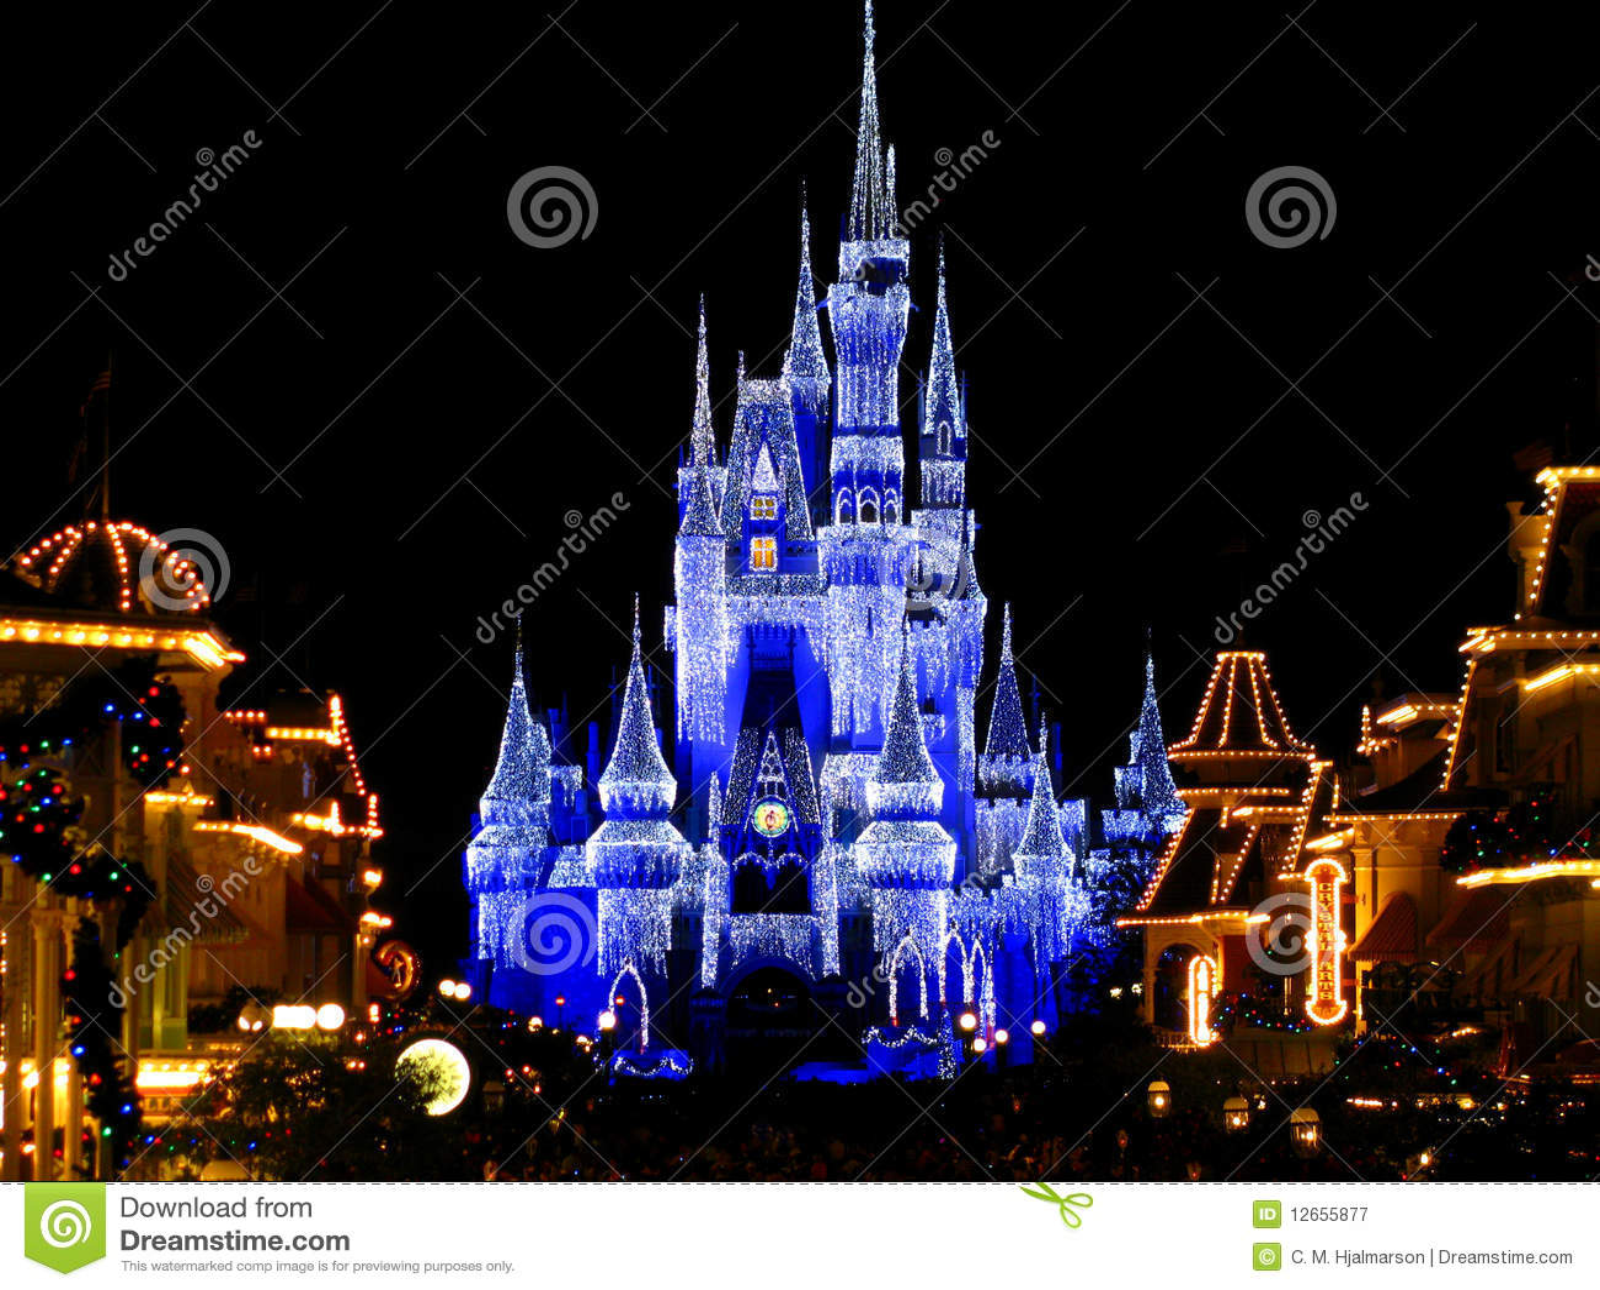 Disneyworld Magic Kingdom Castle Lights 1